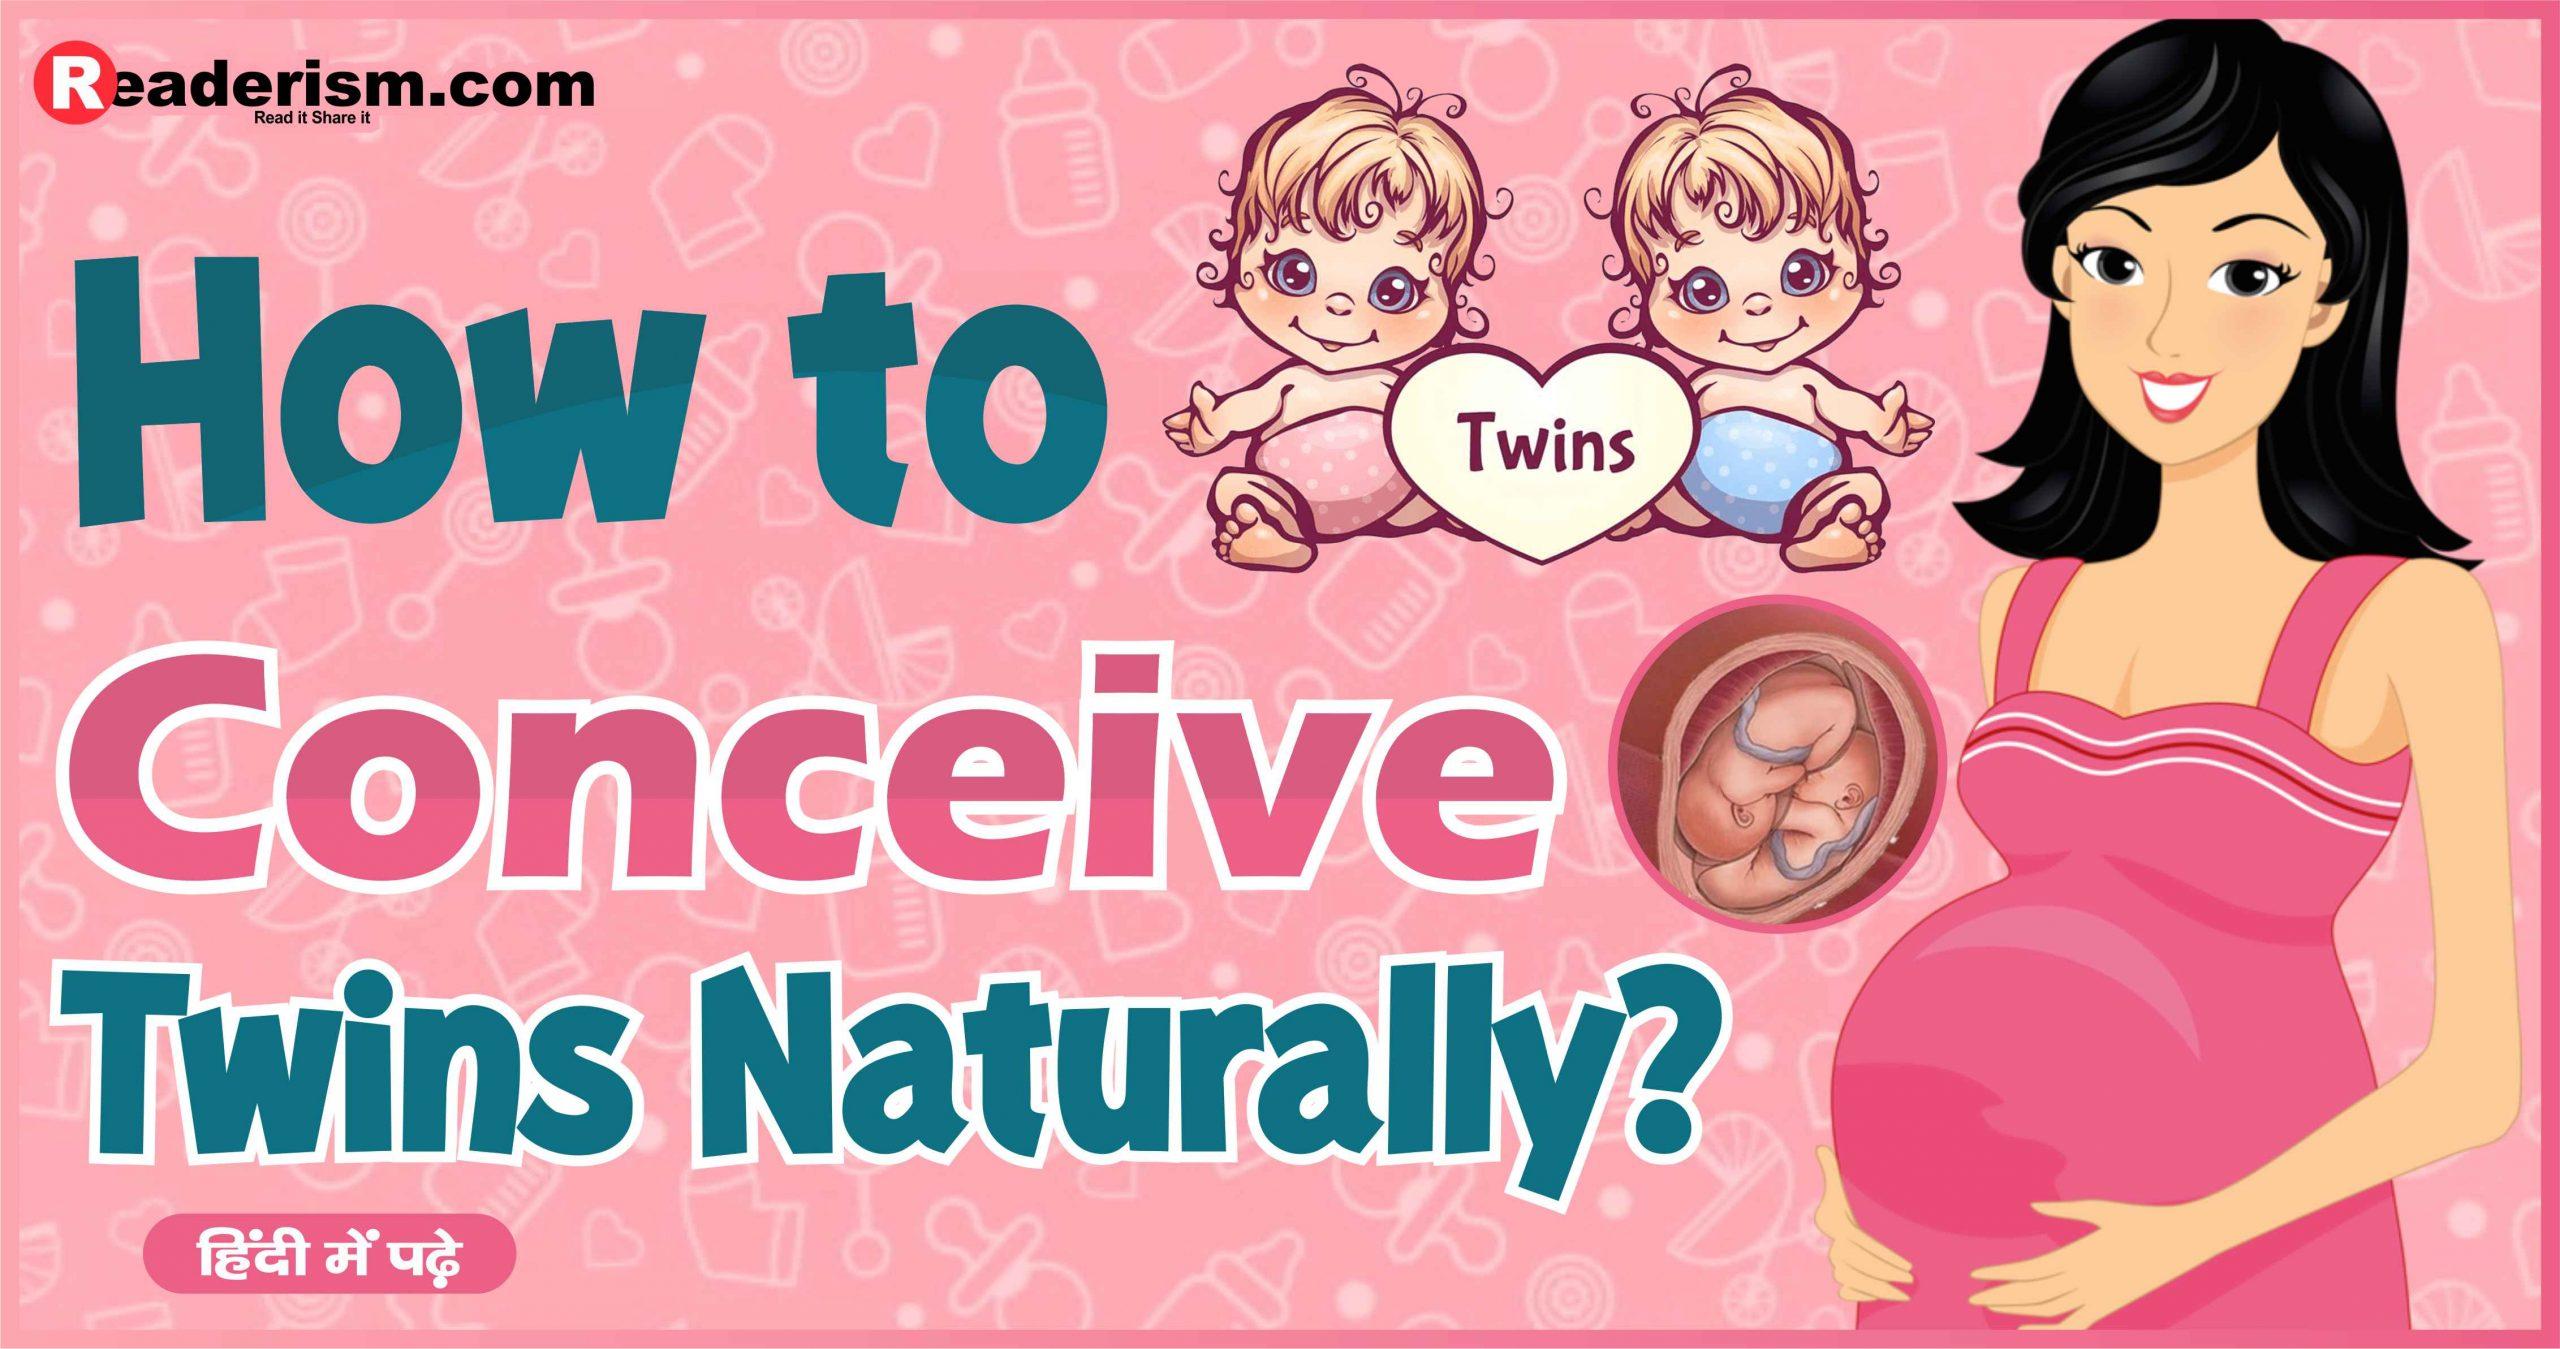 How to Conceive Twins Naturally in Hindi जुड़वा बच्चे कैसे पैदा करें